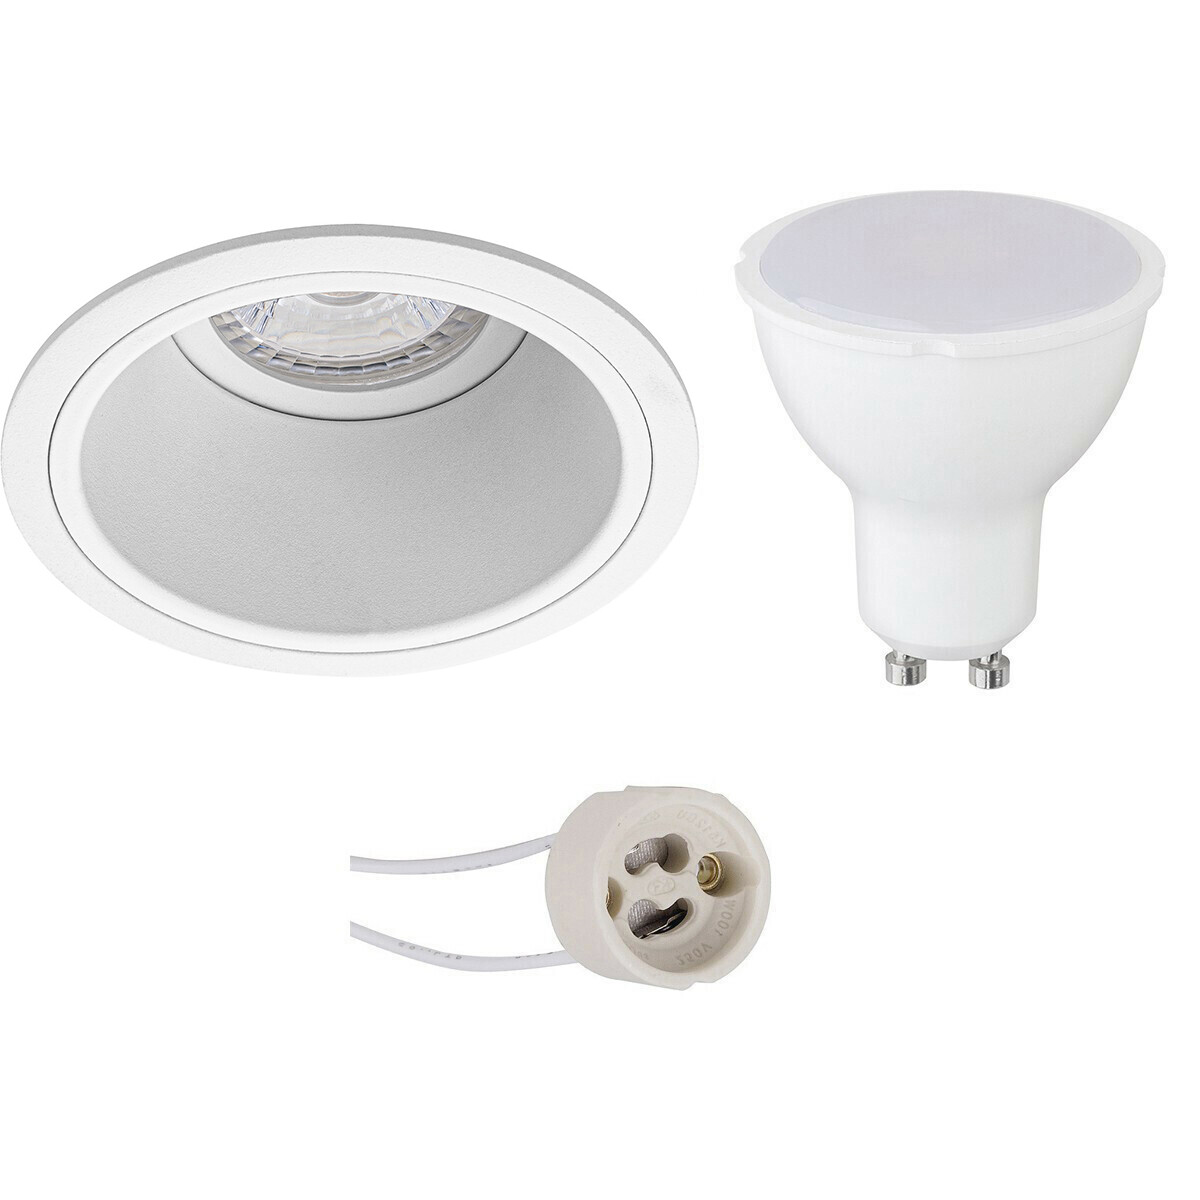 LED Spot Set - Aigi - Pragmi Minko Pro - GU10 Fitting - Inbouw Rond - Mat Wit - 6W - Warm Wit 3000K